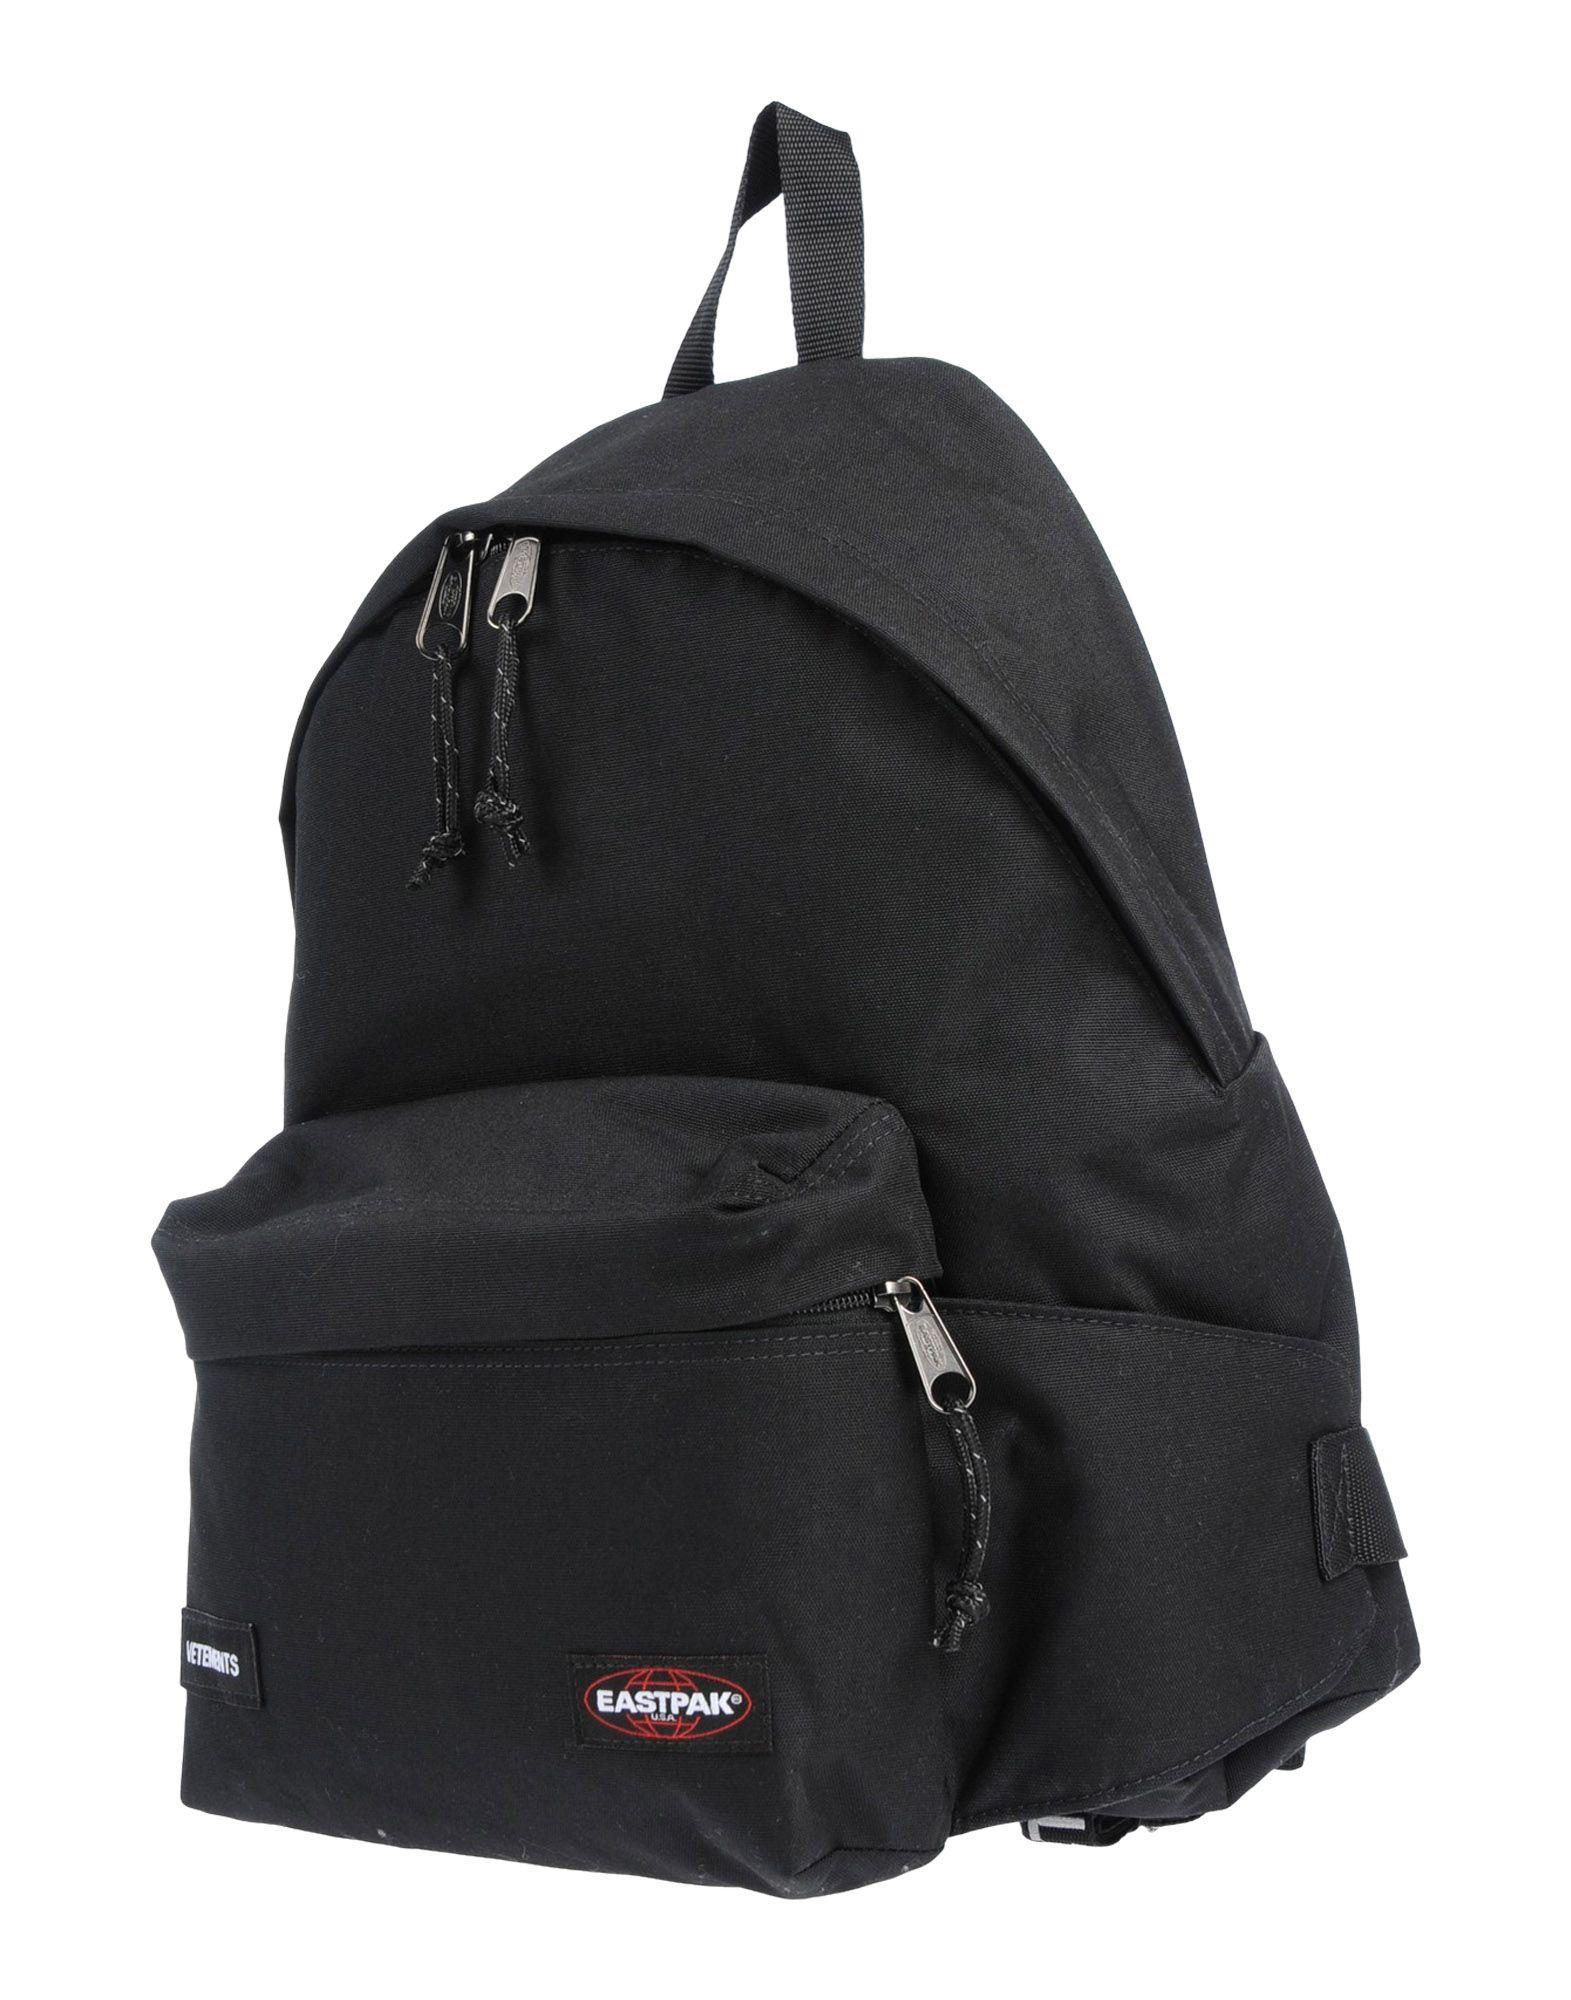 EASTPAK X VETEMENTS | EASTPAK x VETEMENTS Backpacks & Fanny packs 45414178 | Goxip